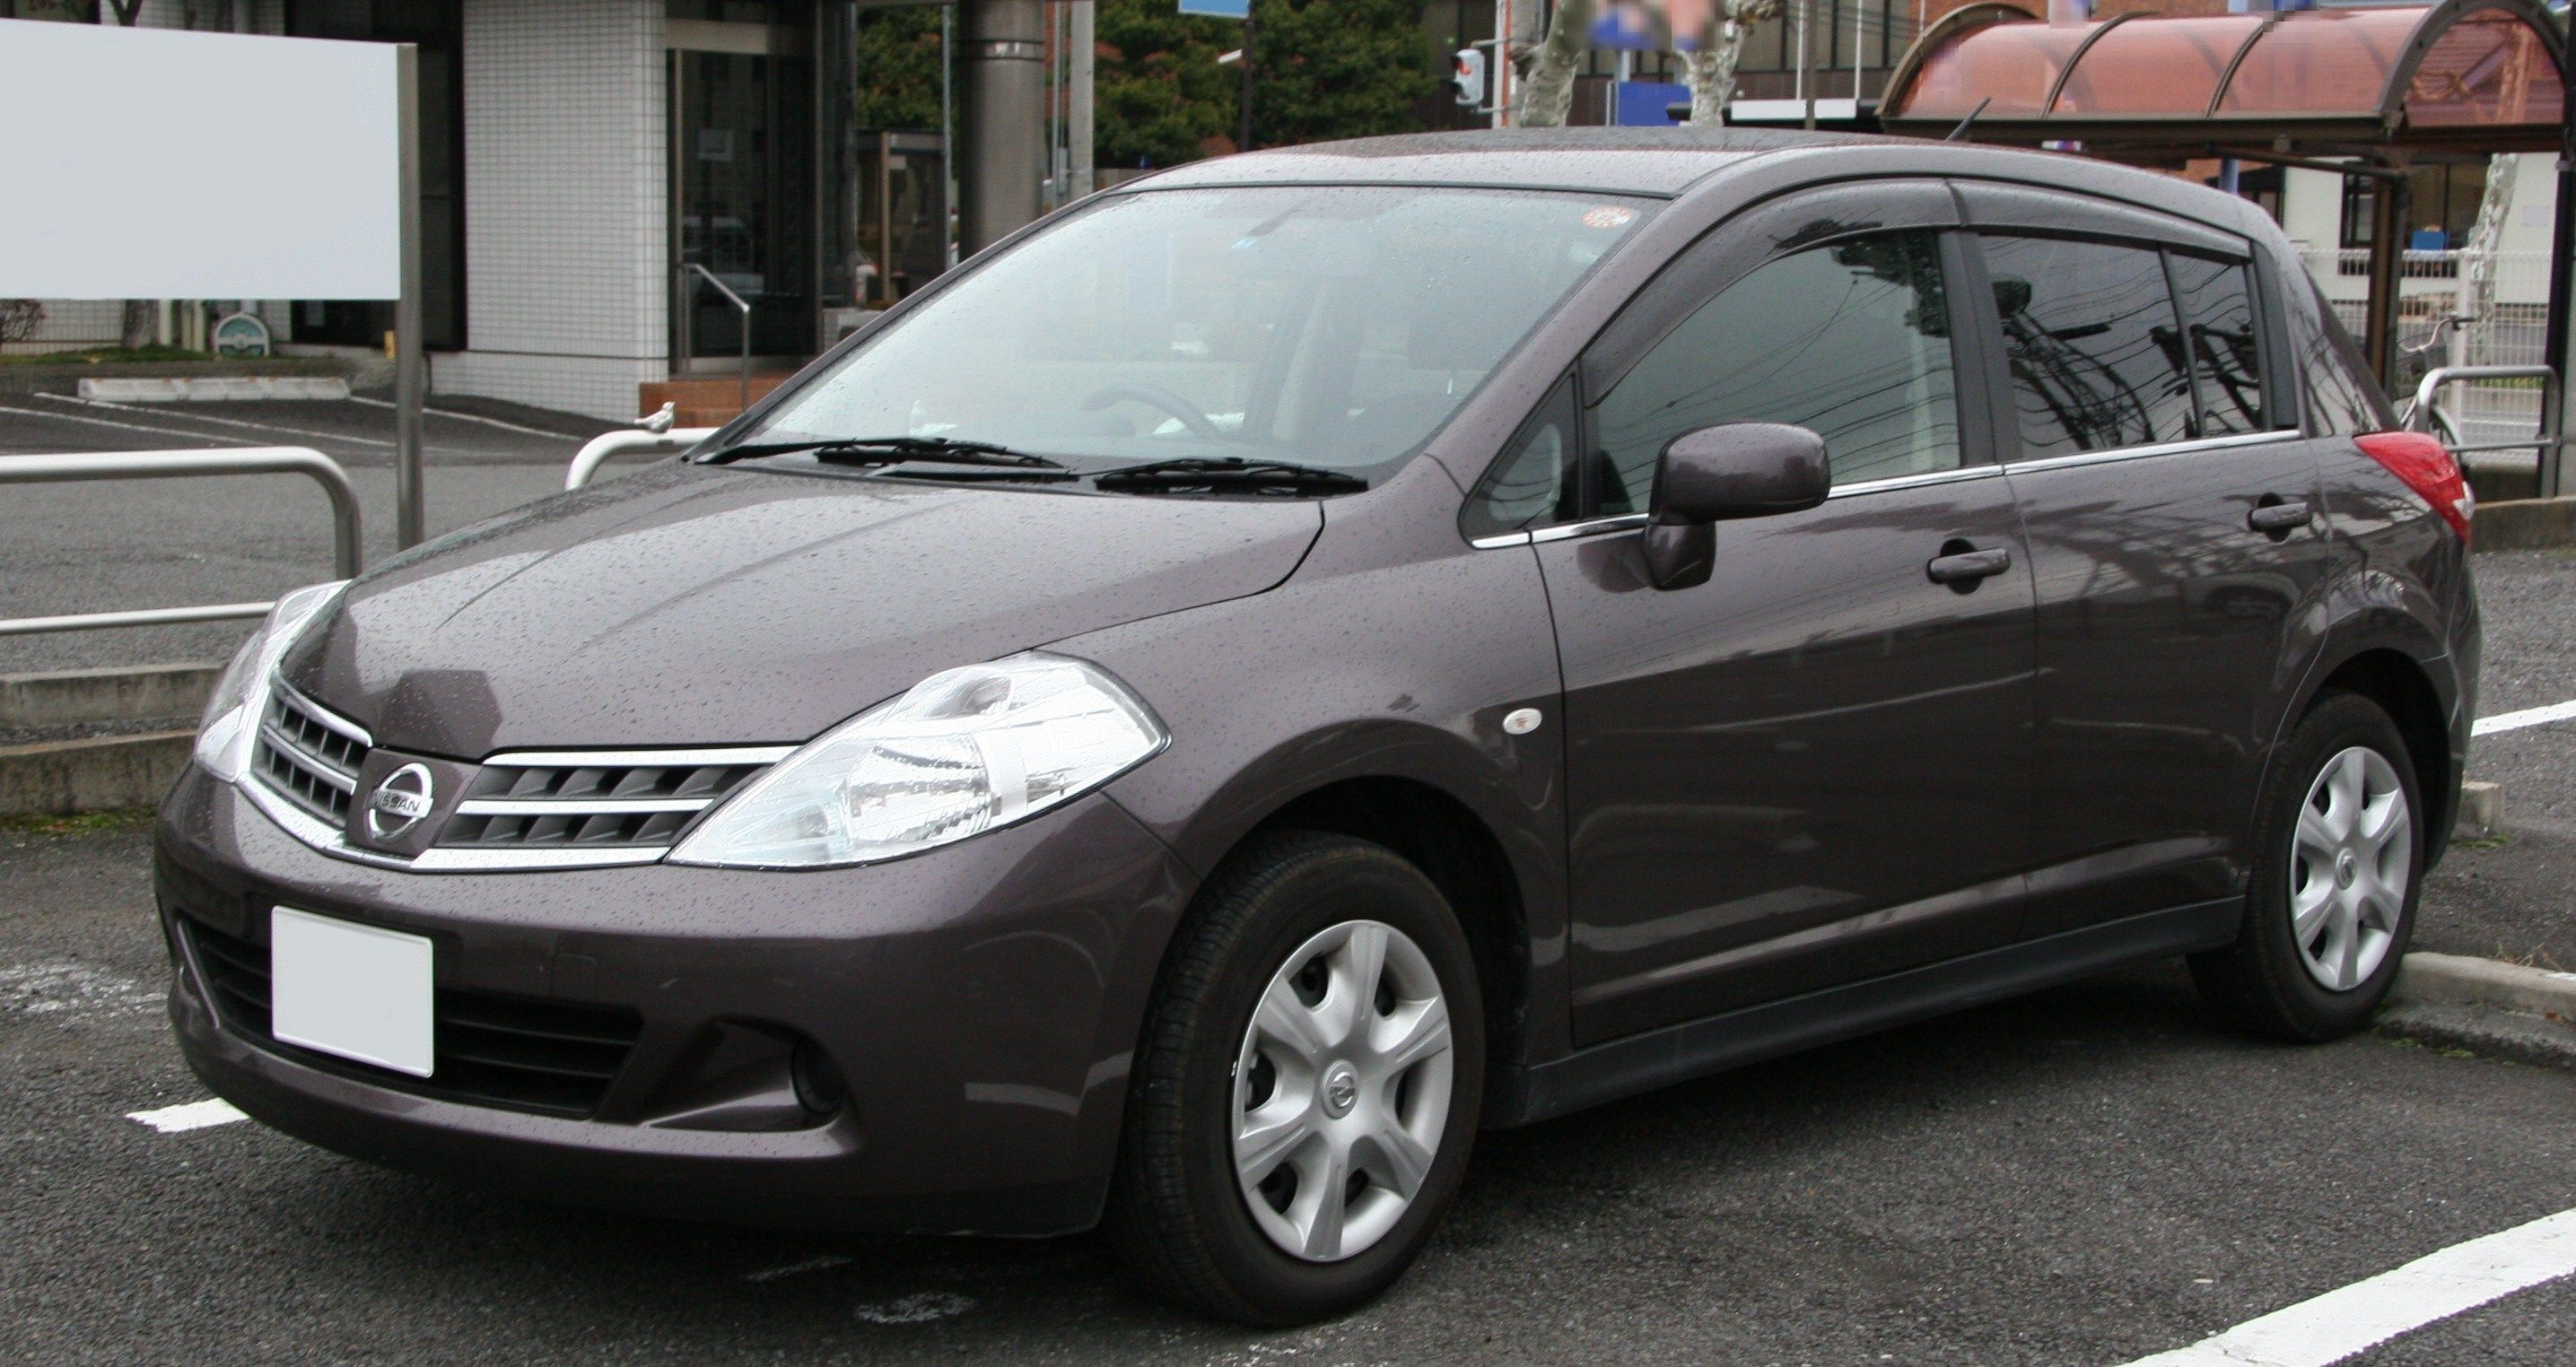 Nissan Tiida I 2004 - 2012 Sedan #3